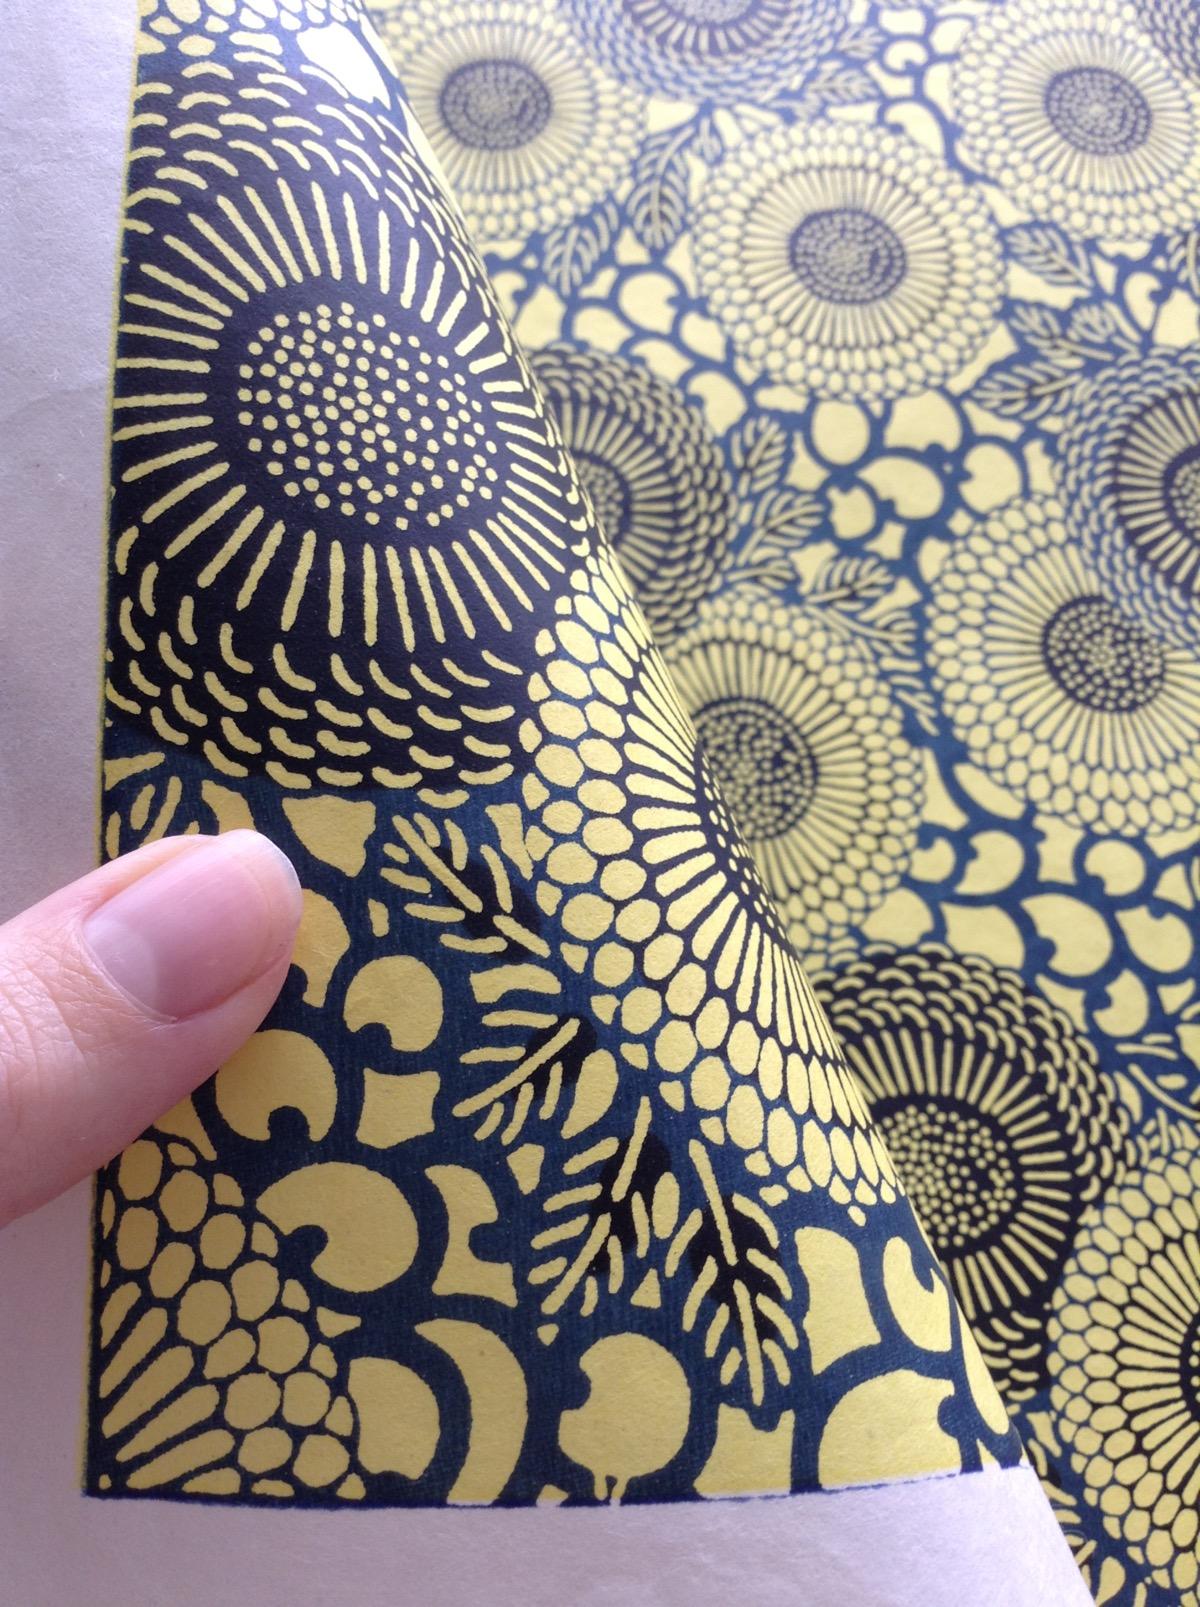 Handmade Yellow Daisies Katazome Paper from Japan - 76